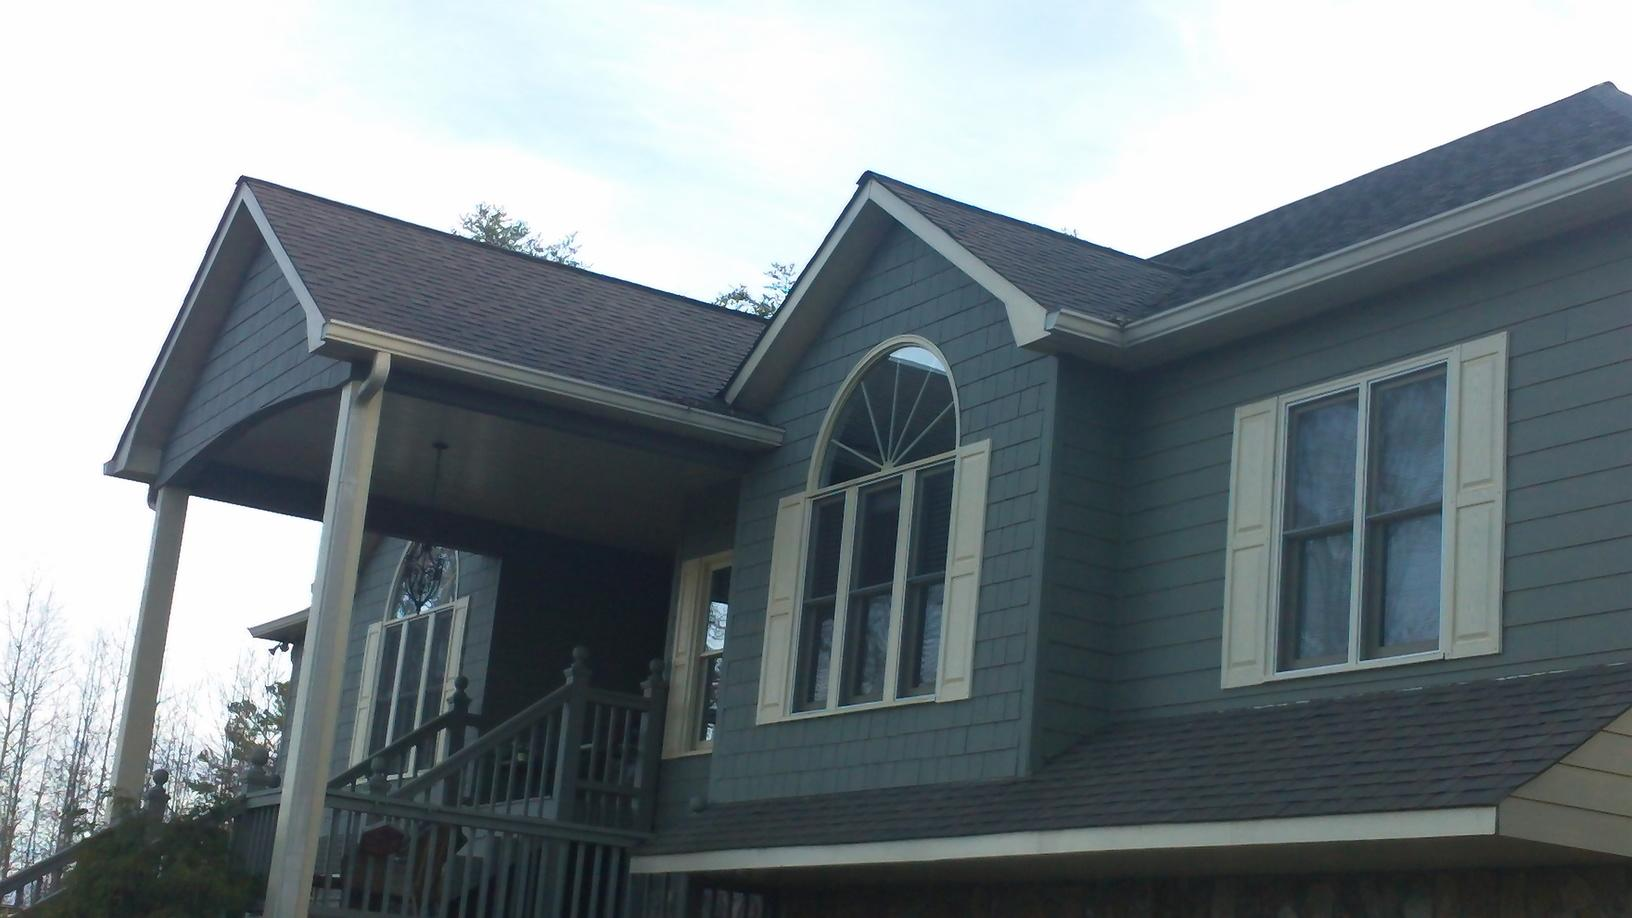 Hail Damage Roof Repair in Blue Ridge, GA - Before Photo